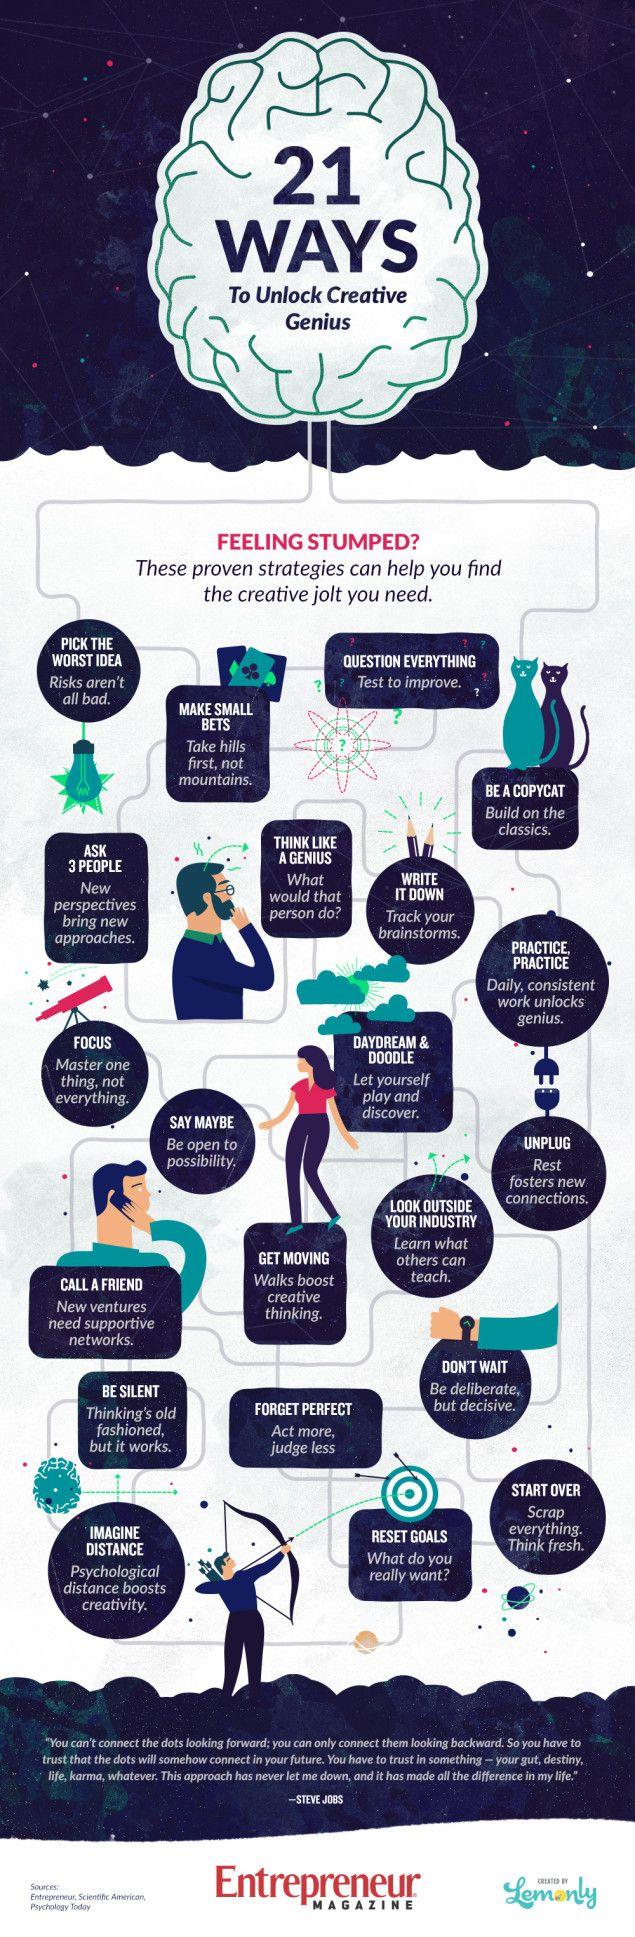 21 Ways to Unlock Your Creative Genius | Lemonly + Entrepreneur Magazine #Infographic